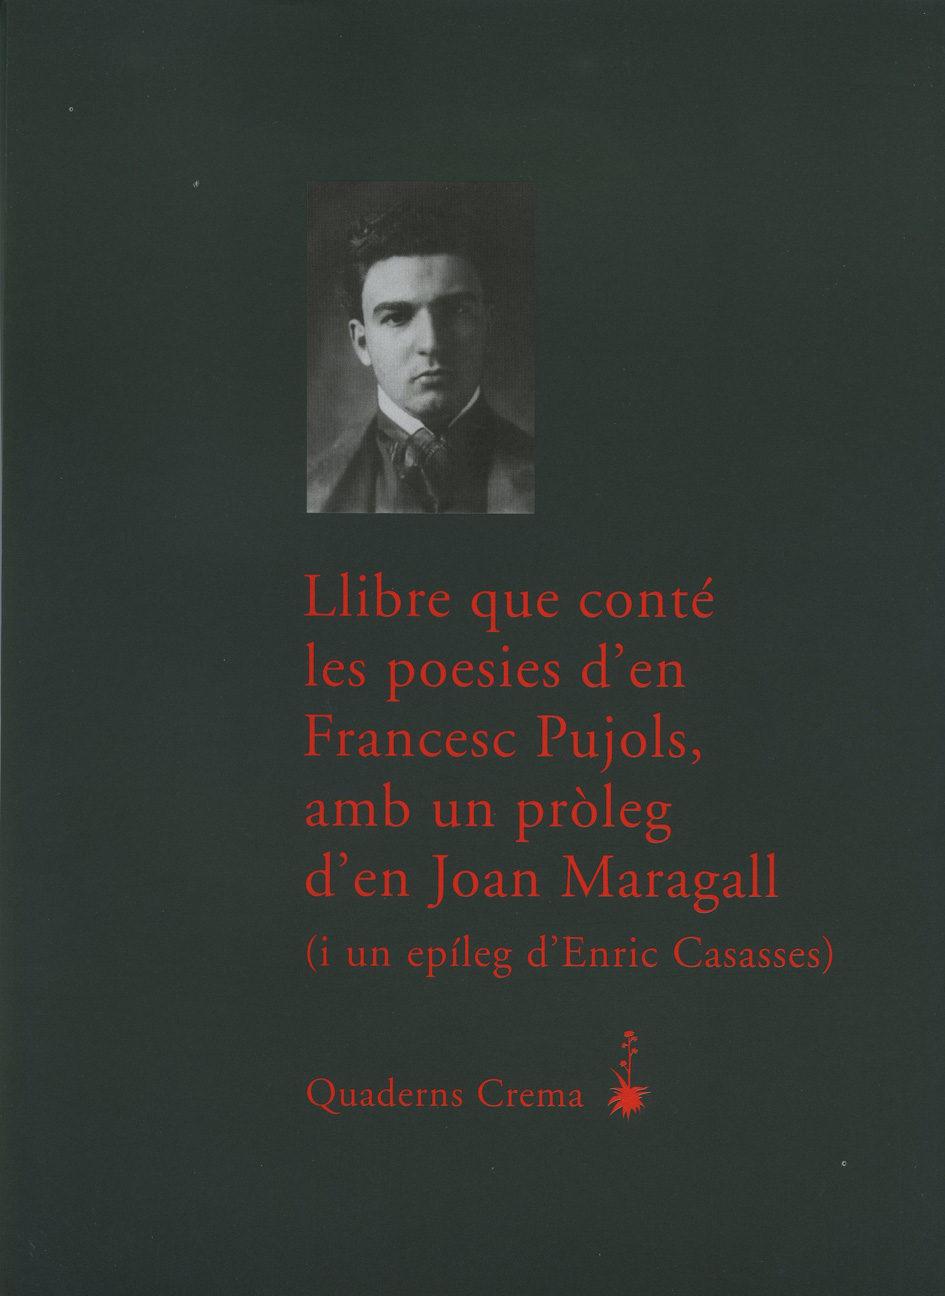 El Llibre Que Conte Poesies por Francesc Pujols epub